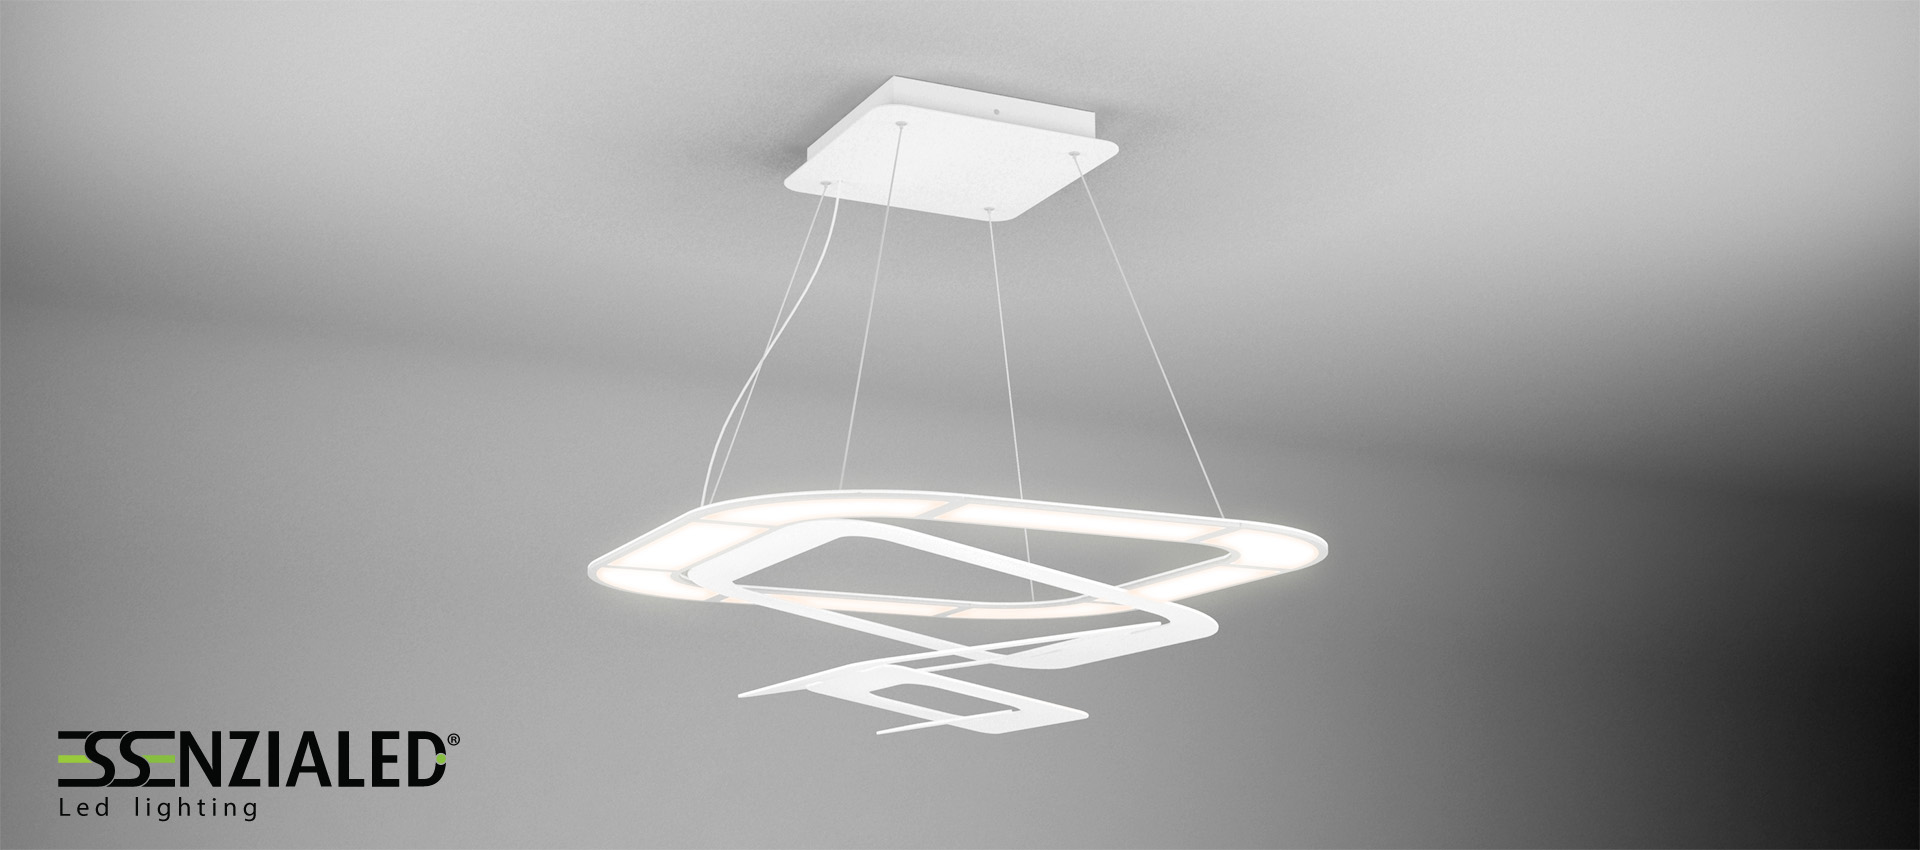 Dimensioni Tavolo Da Cucina : Lampada a sospensione ledessenzialed illuminazione led